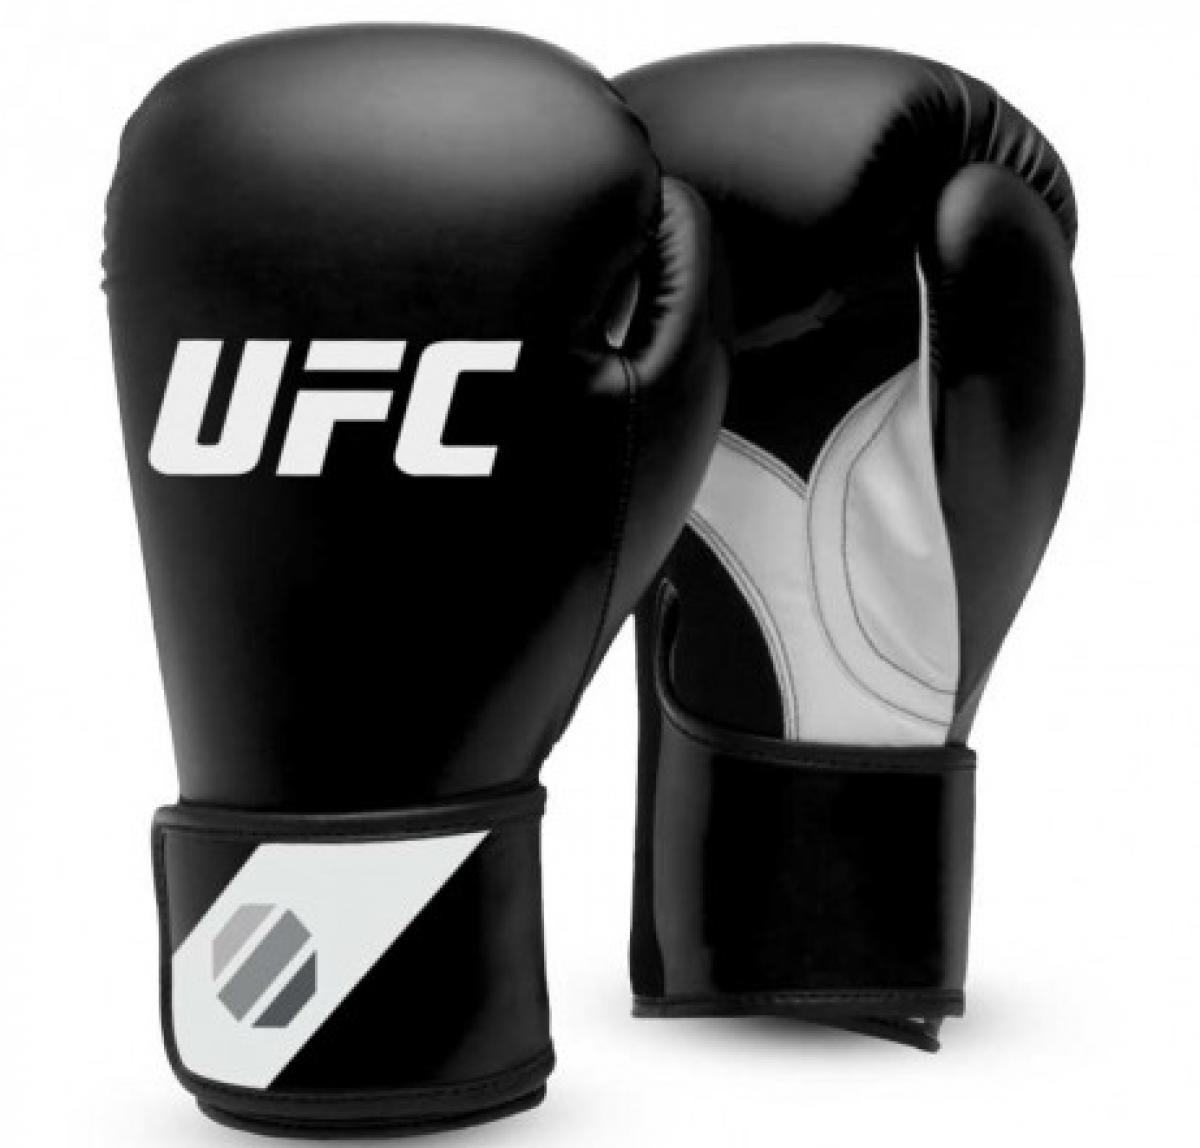 UFC Fitness Training Boxhandschuhe schwarz/weiß/silber